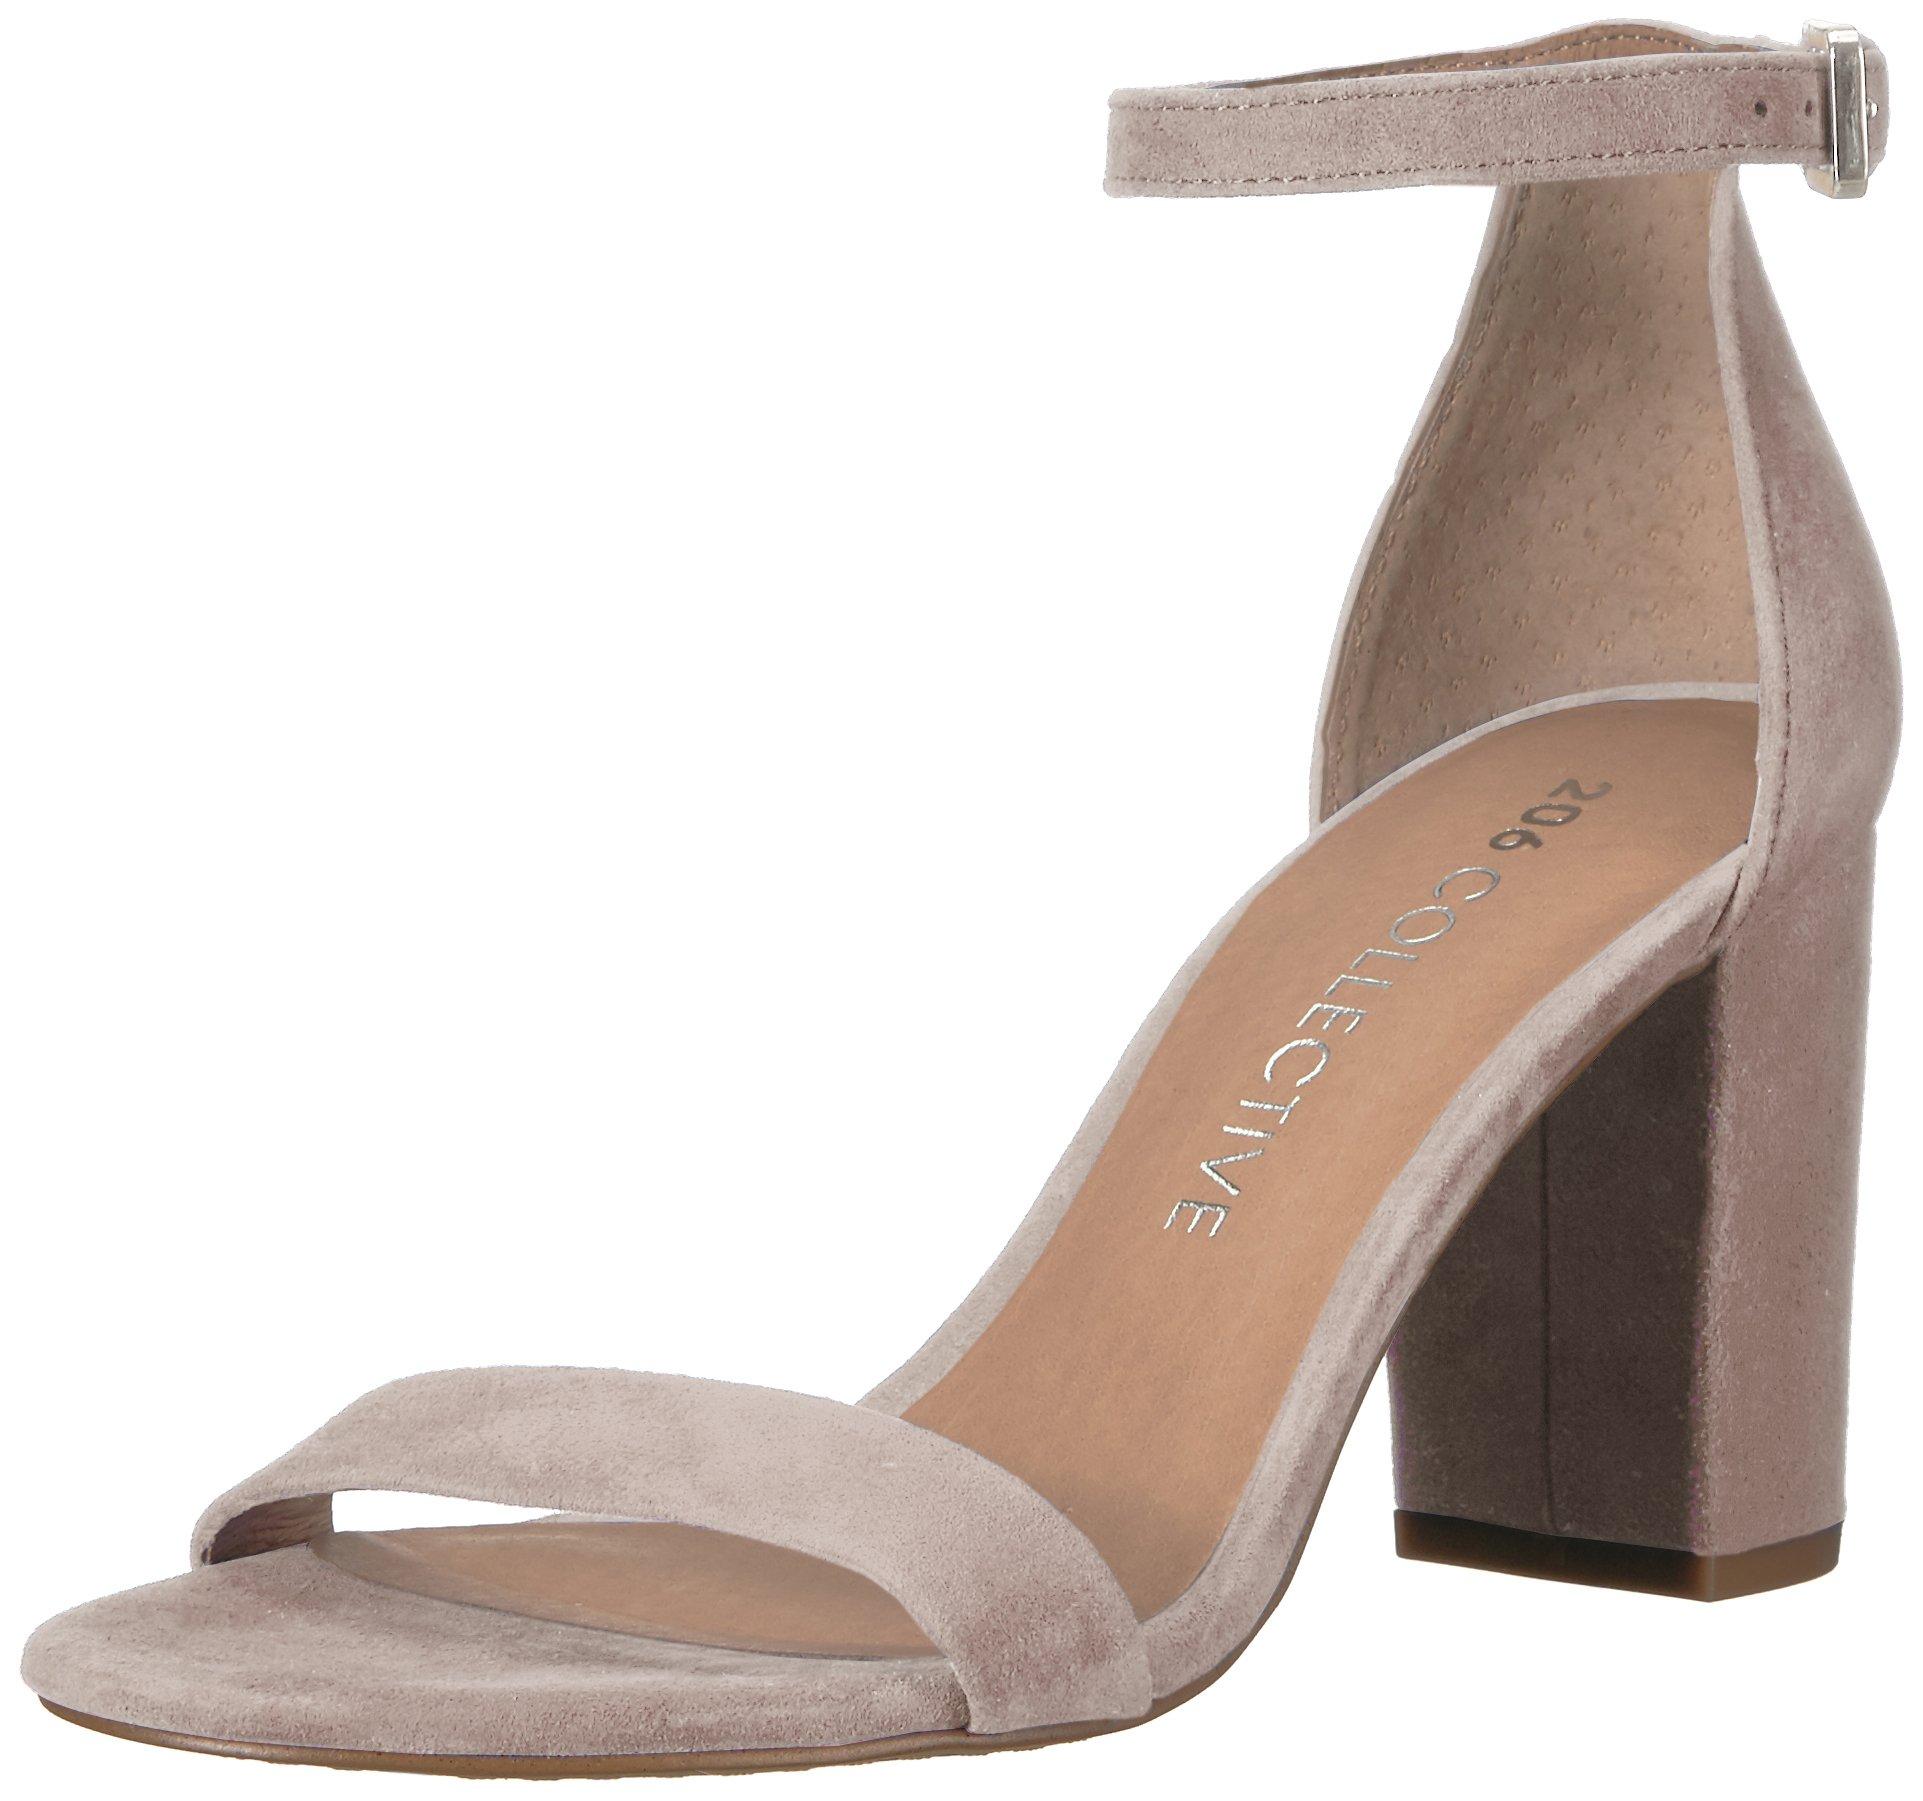 206 Collective Women's Loyal Block Heel Dress High Heeled Sandal, Blush Suede, 7.5 B US